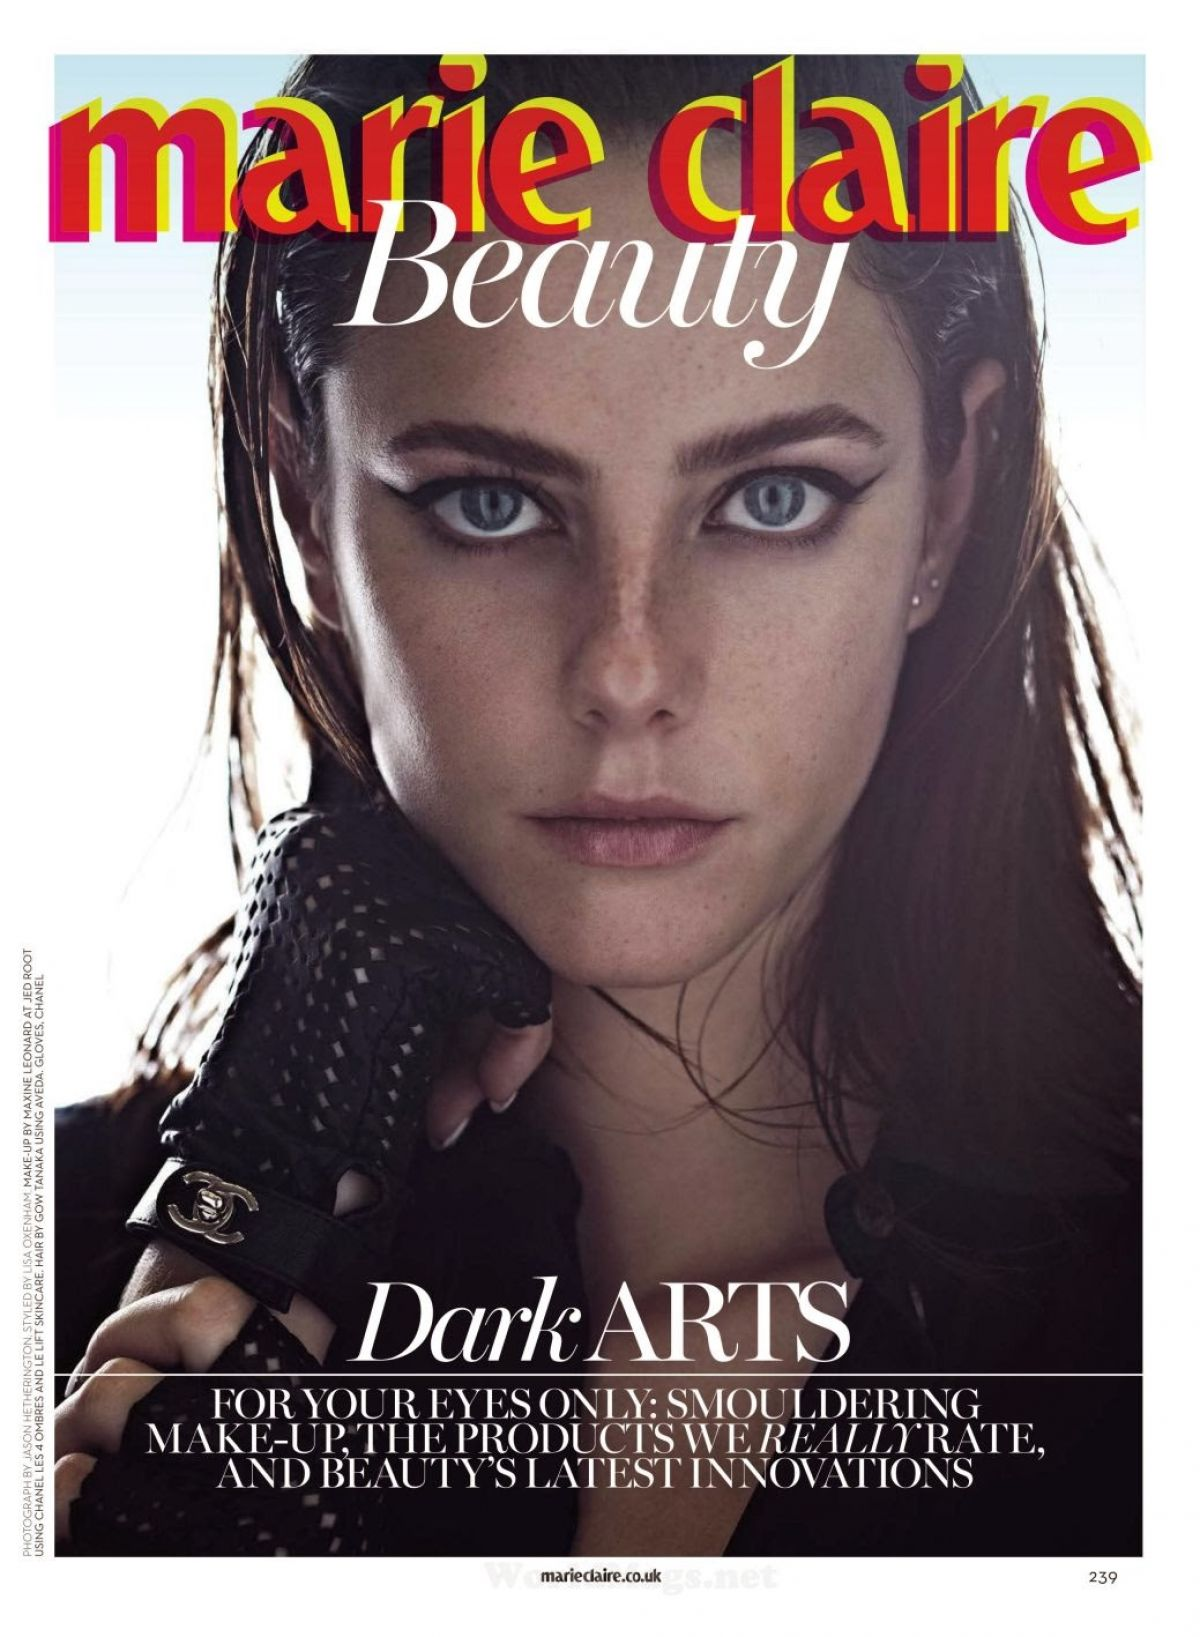 KAYA SCODELARIO in Marie Claire Magazine, April 2014 Issue